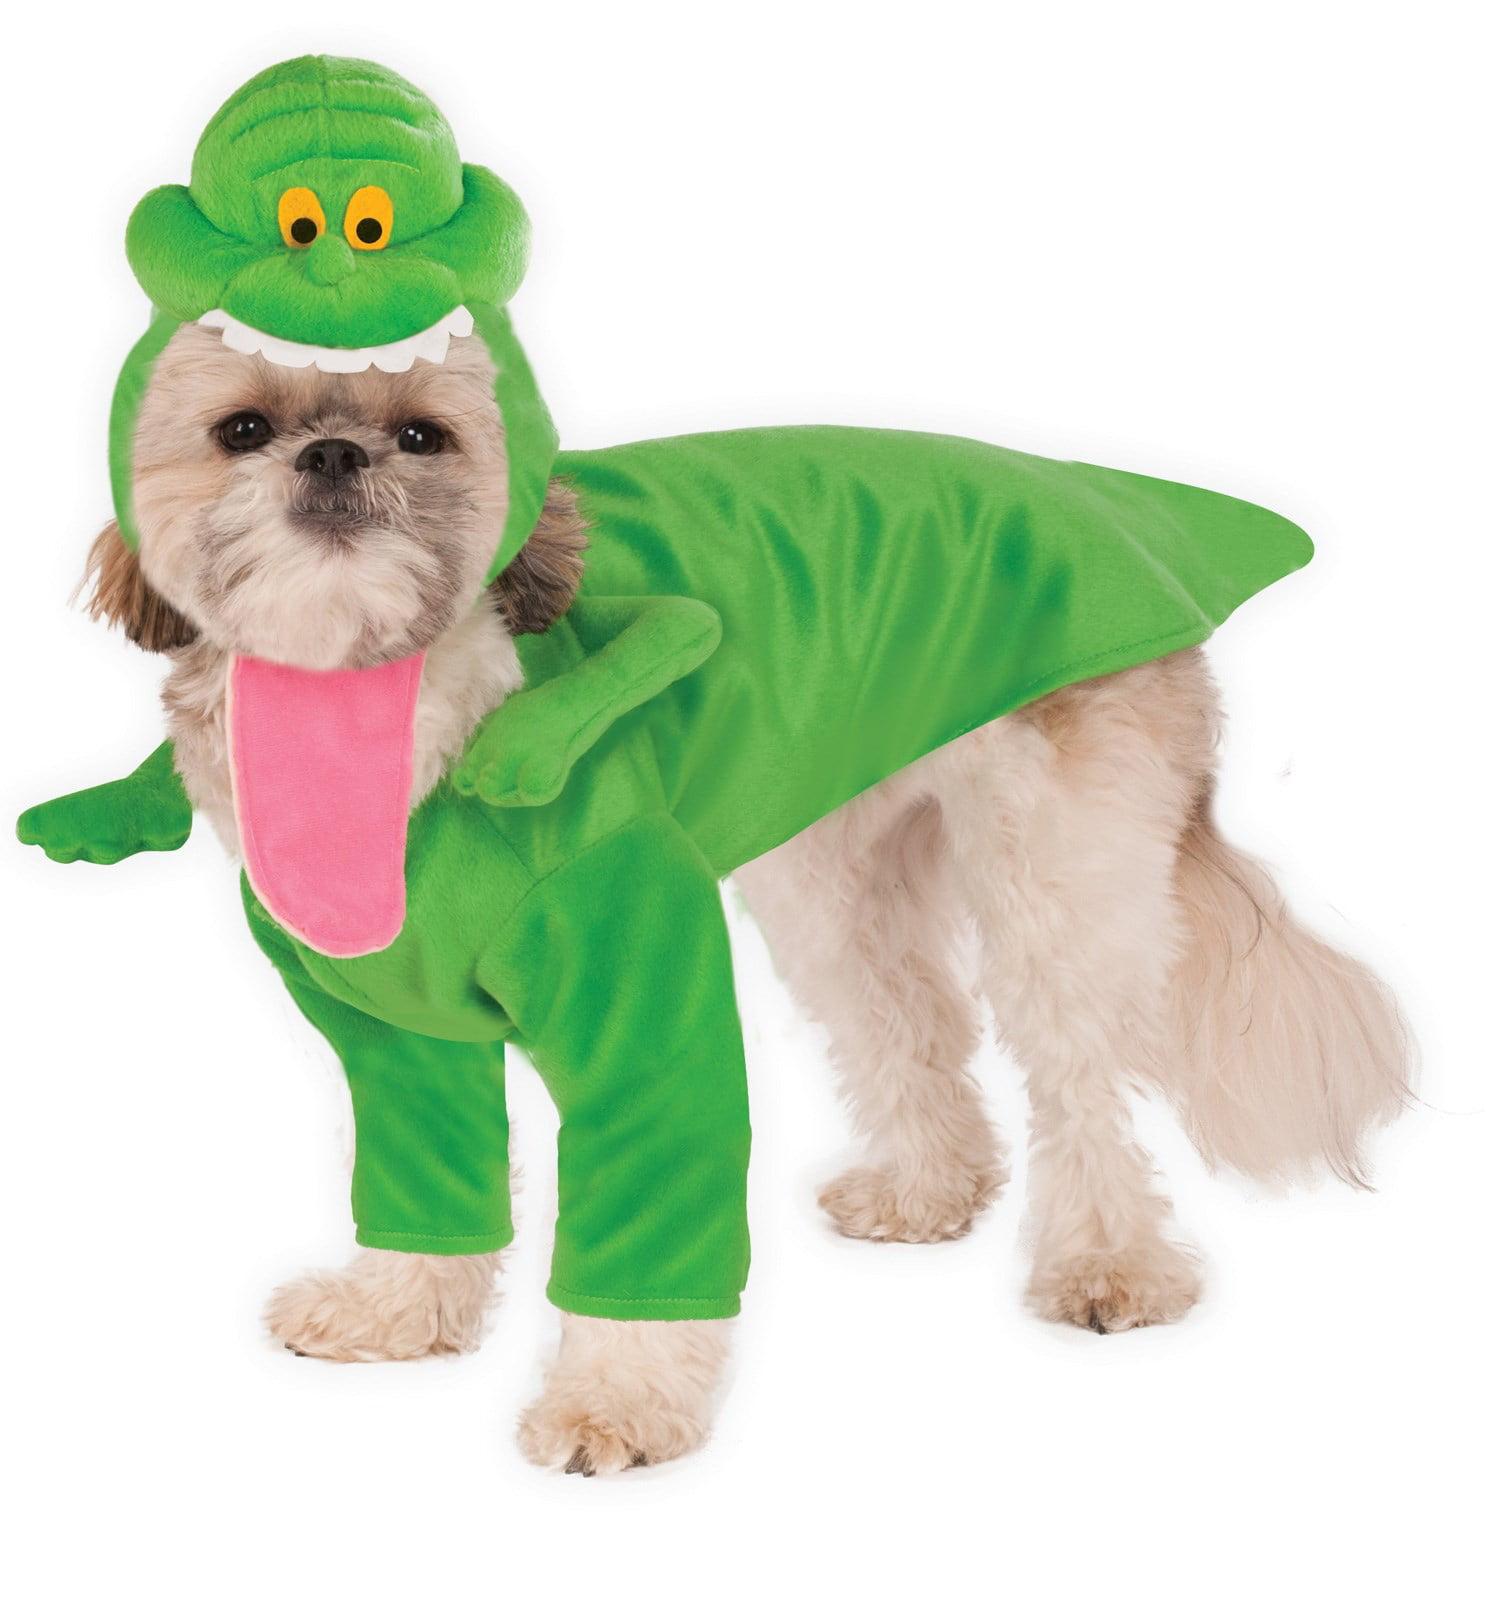 Ghostbuster Slimer Pet Costume